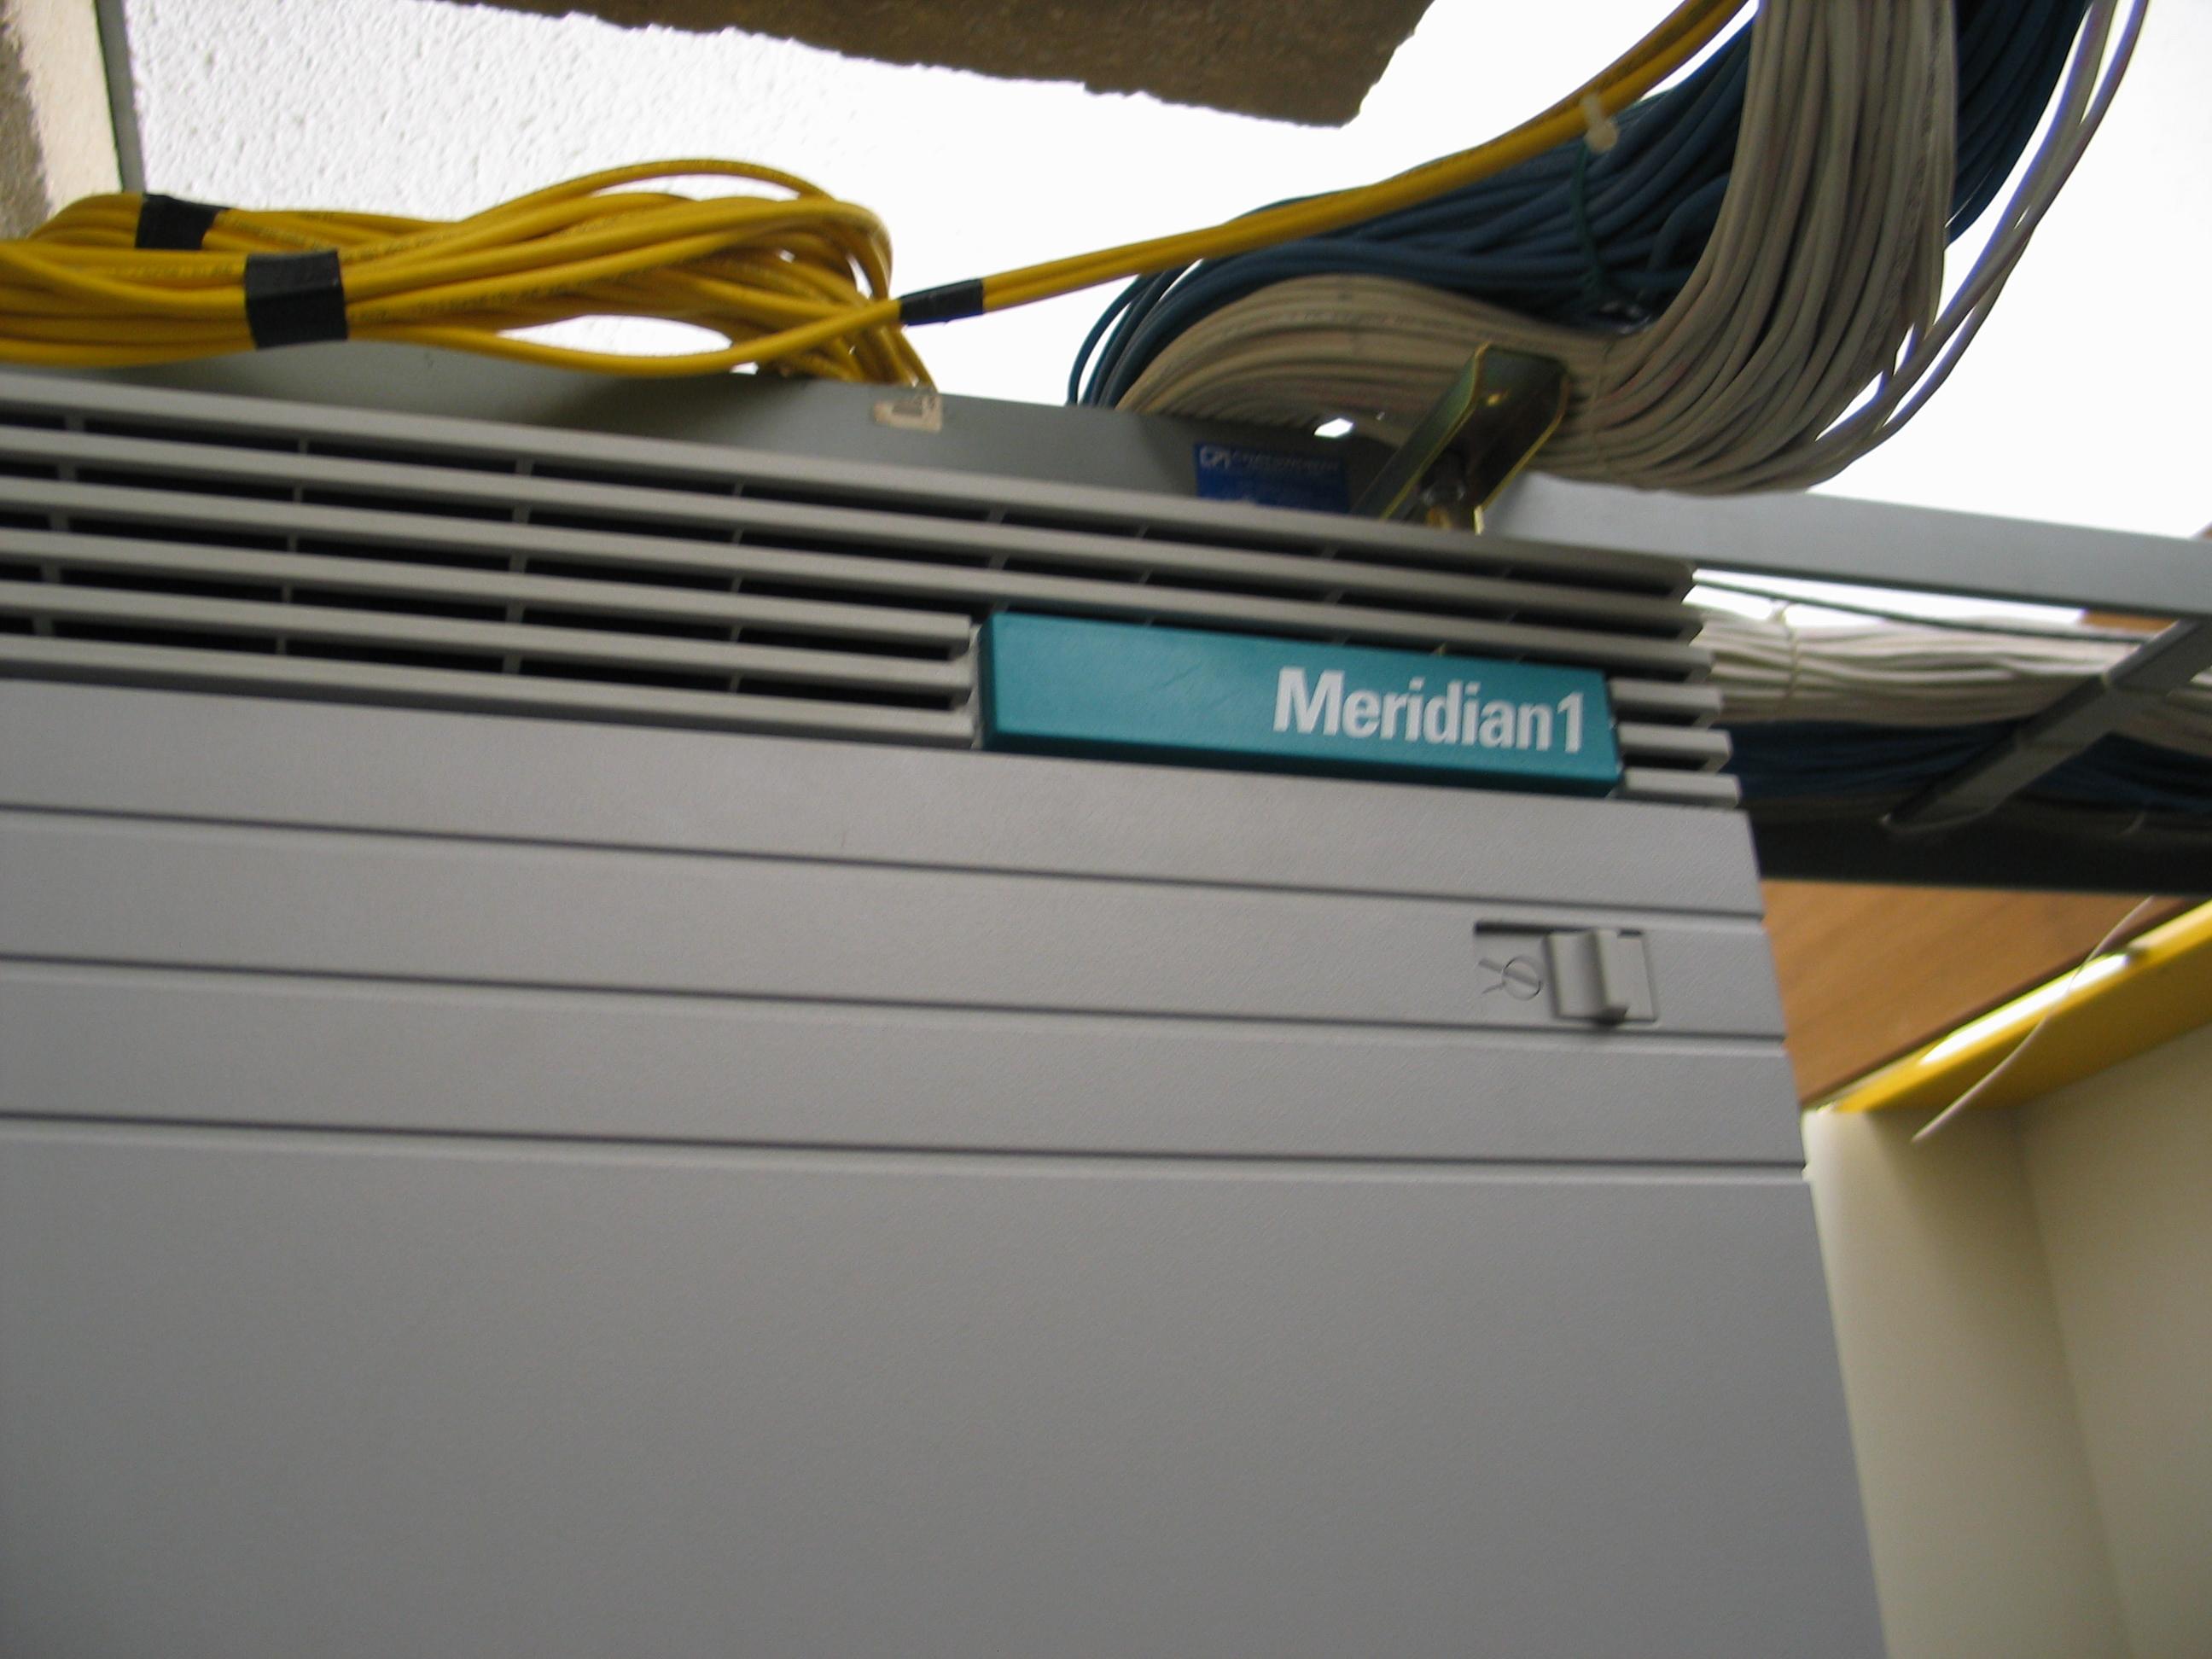 Nortel Meridian - Wikipedia